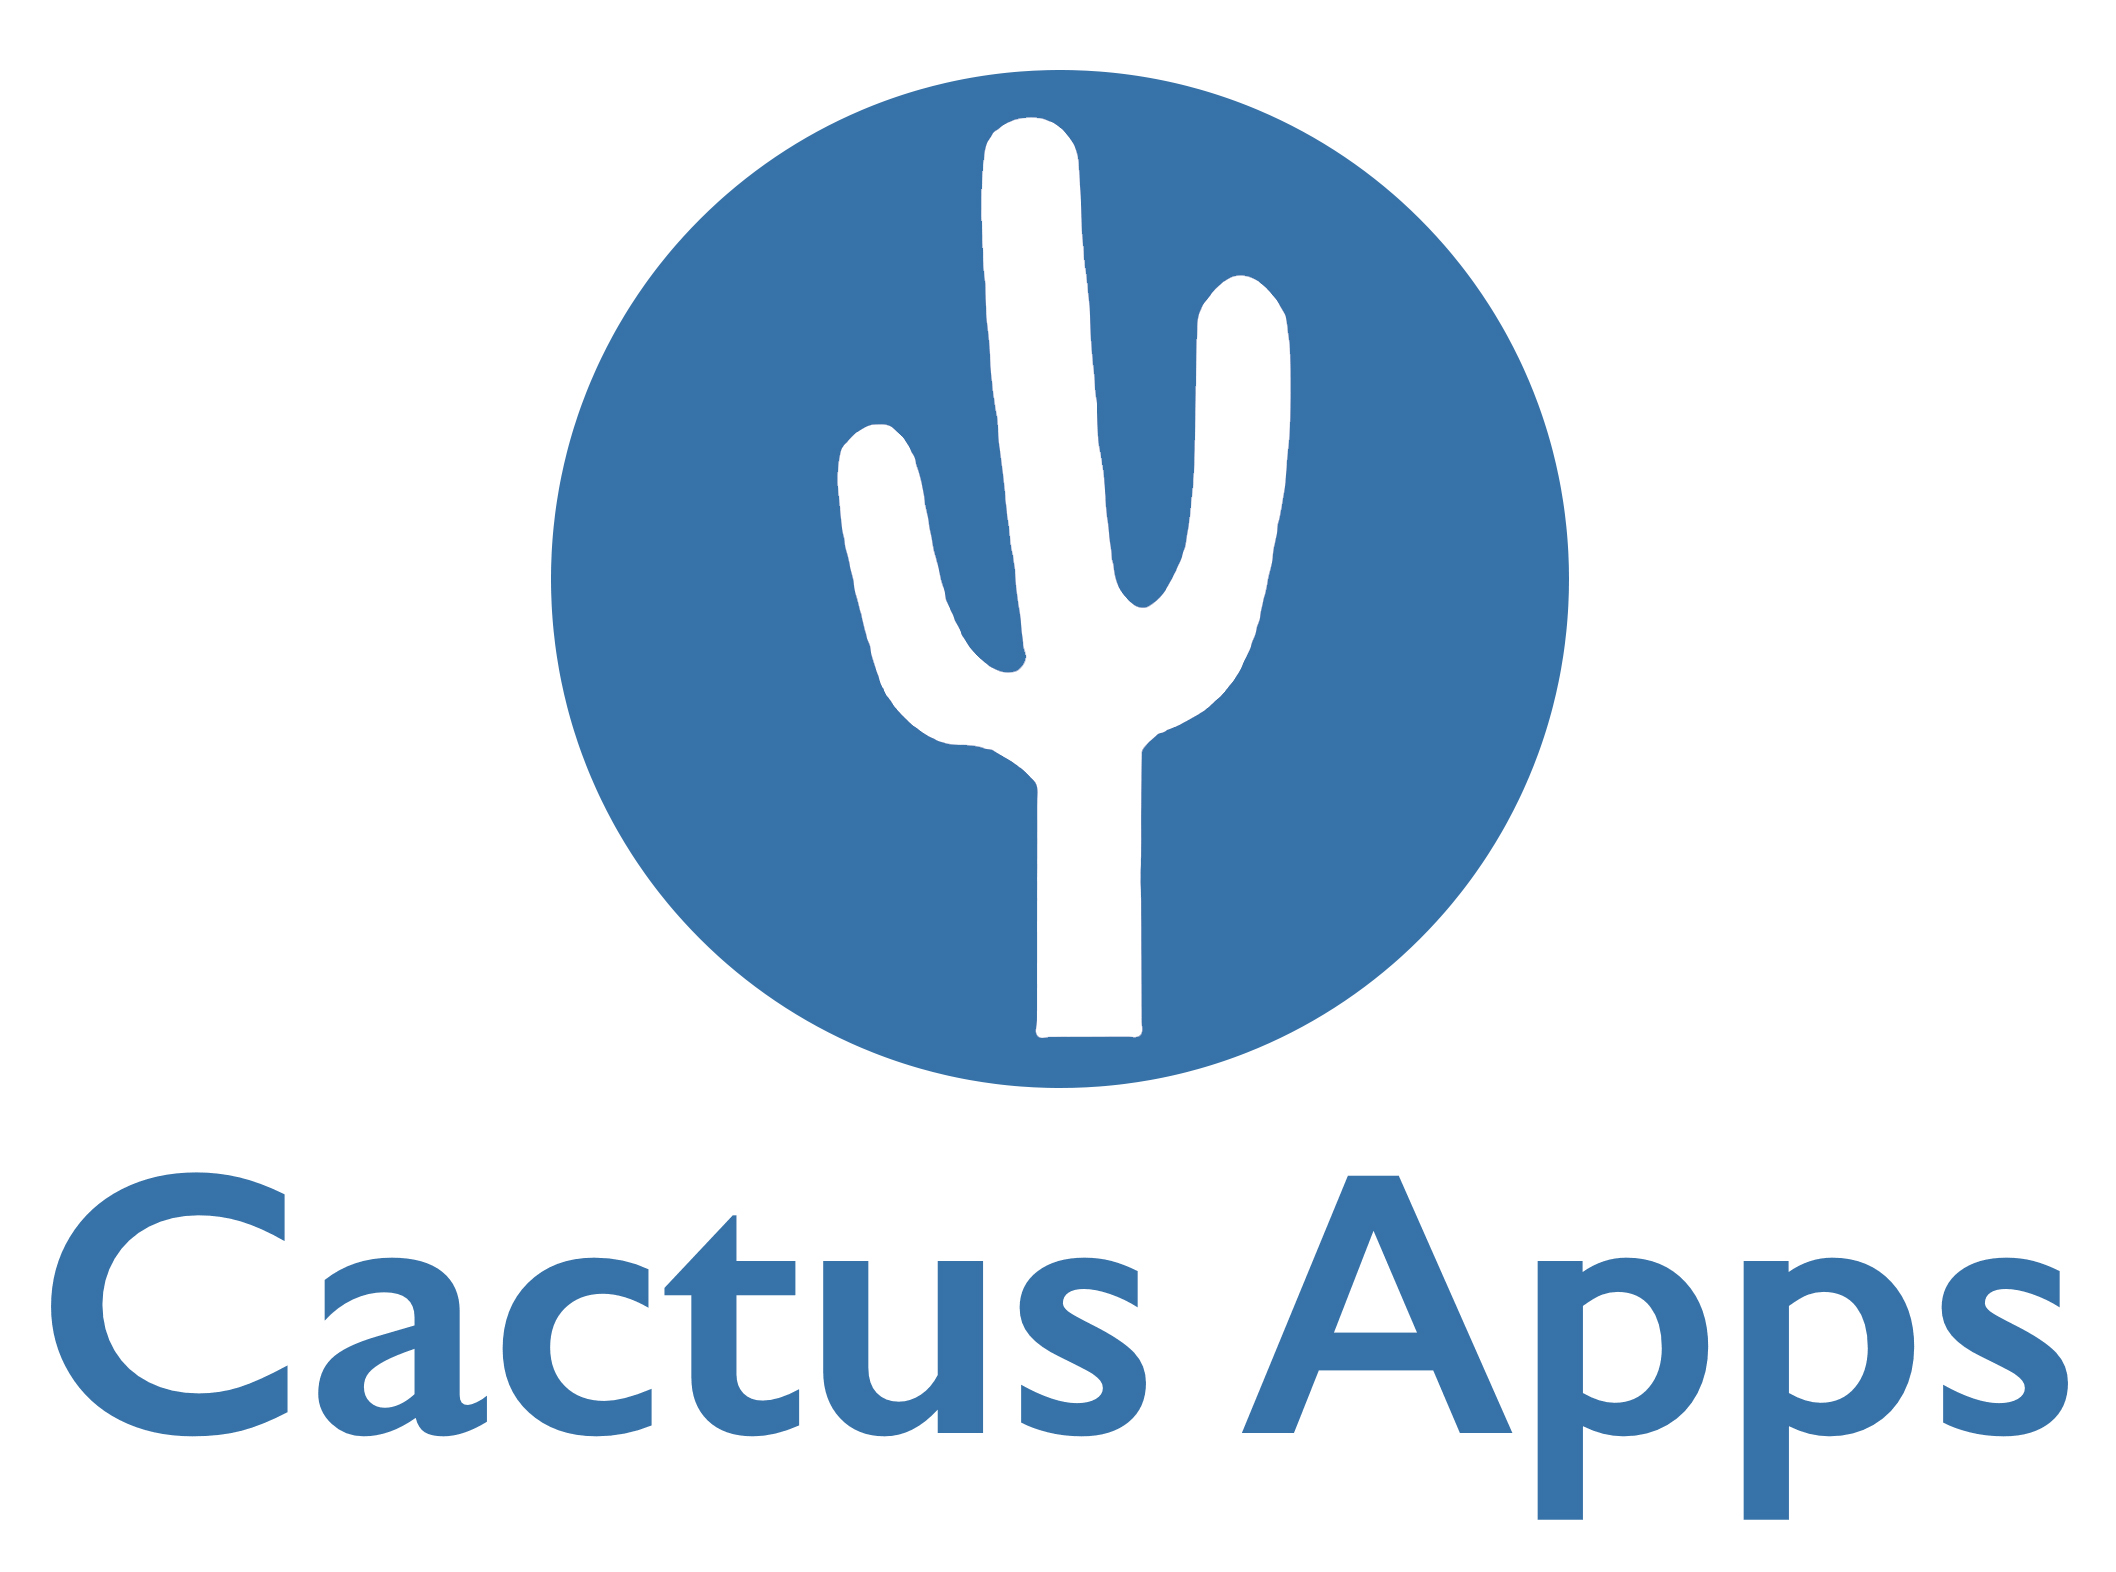 thumbnail_Cactus Apps logo.jpg